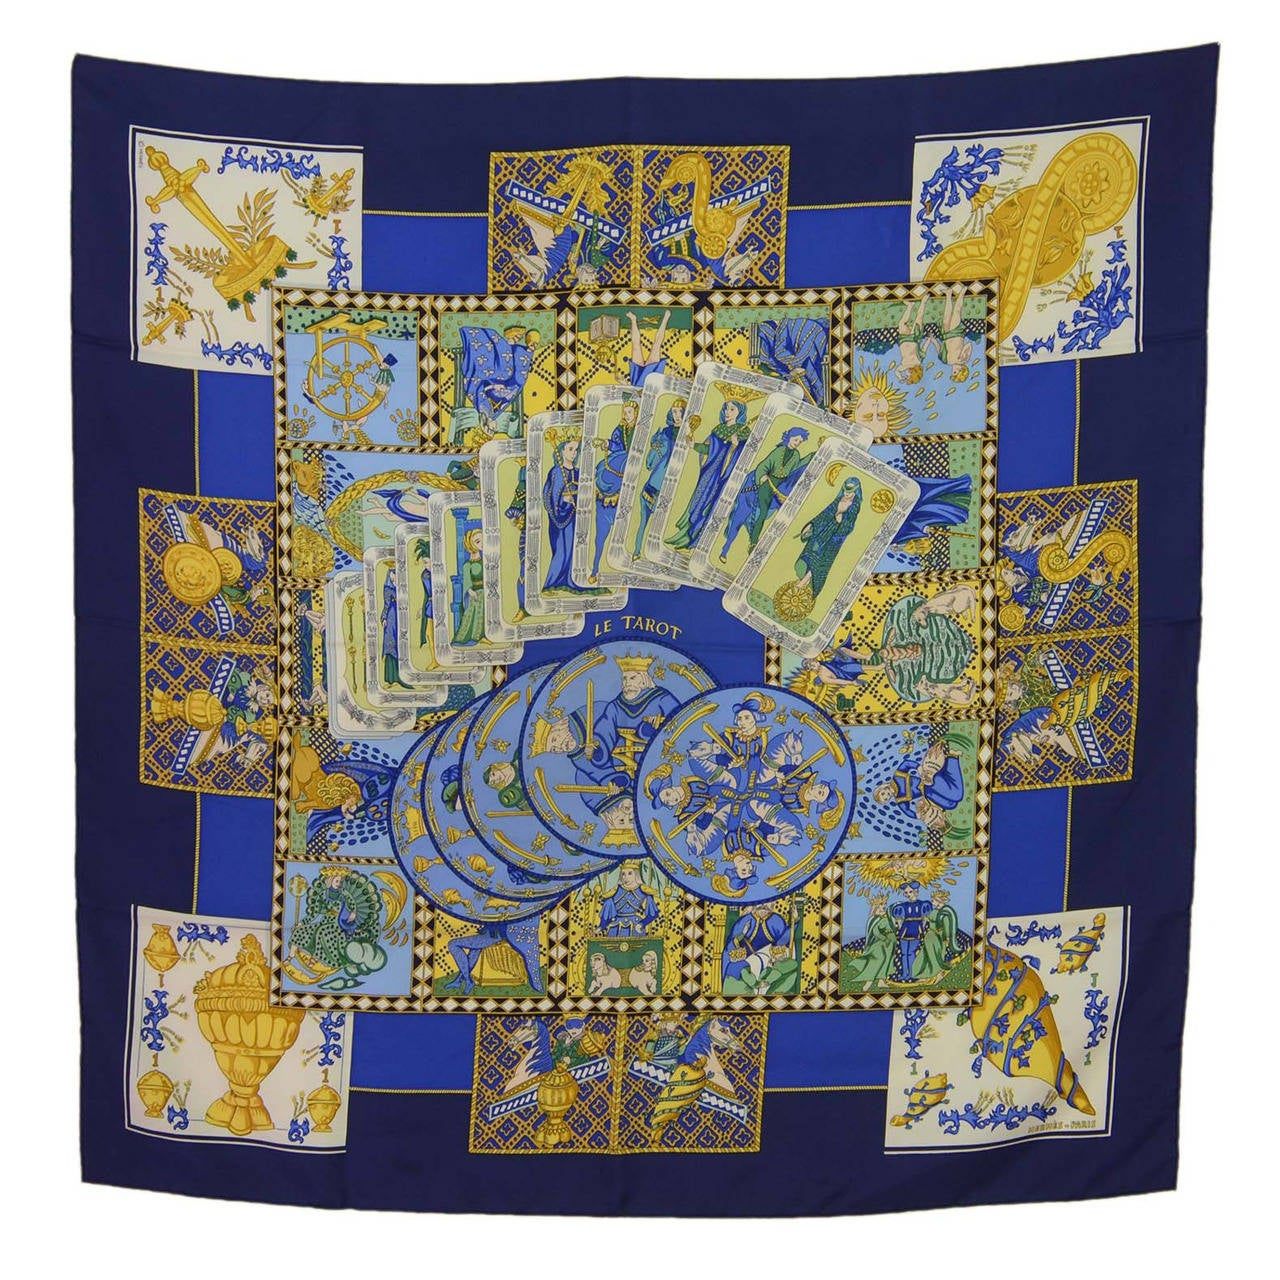 HERMES Blue Beige Yellow Le Tarot Silk Scarf 90 cm at